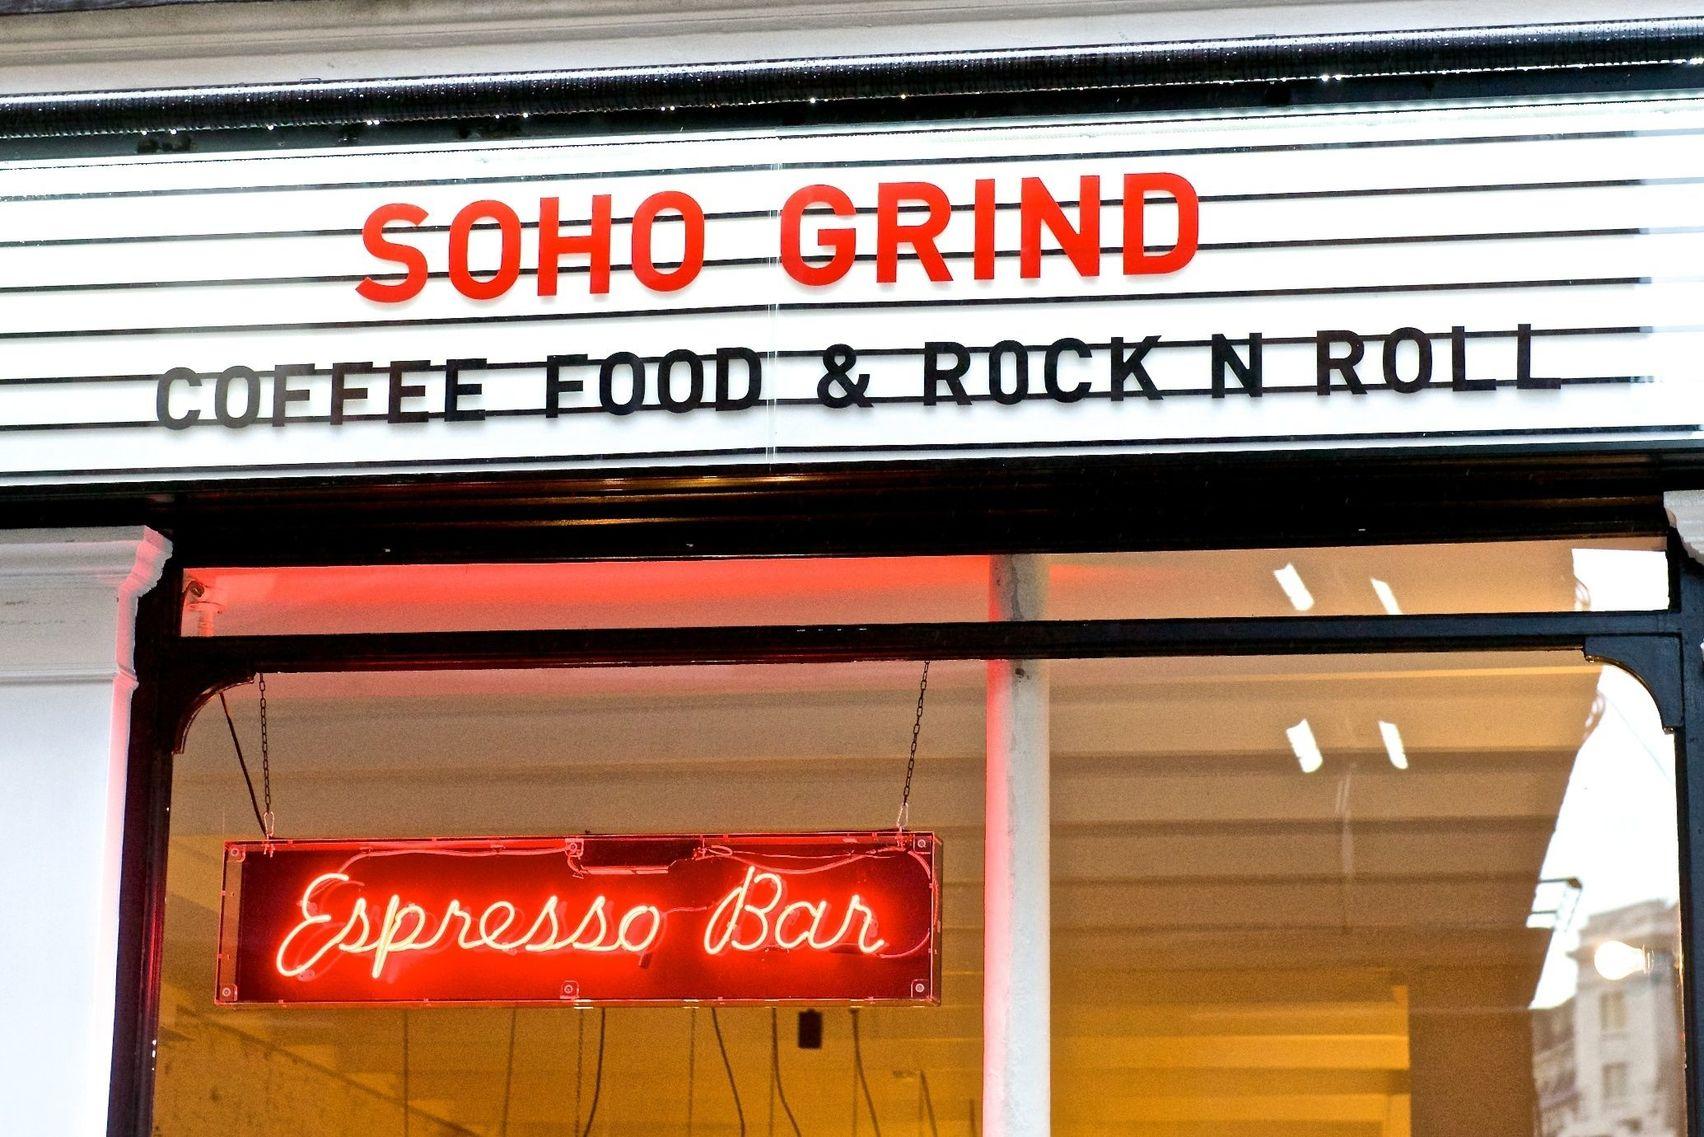 Whole Venue, Soho Grind